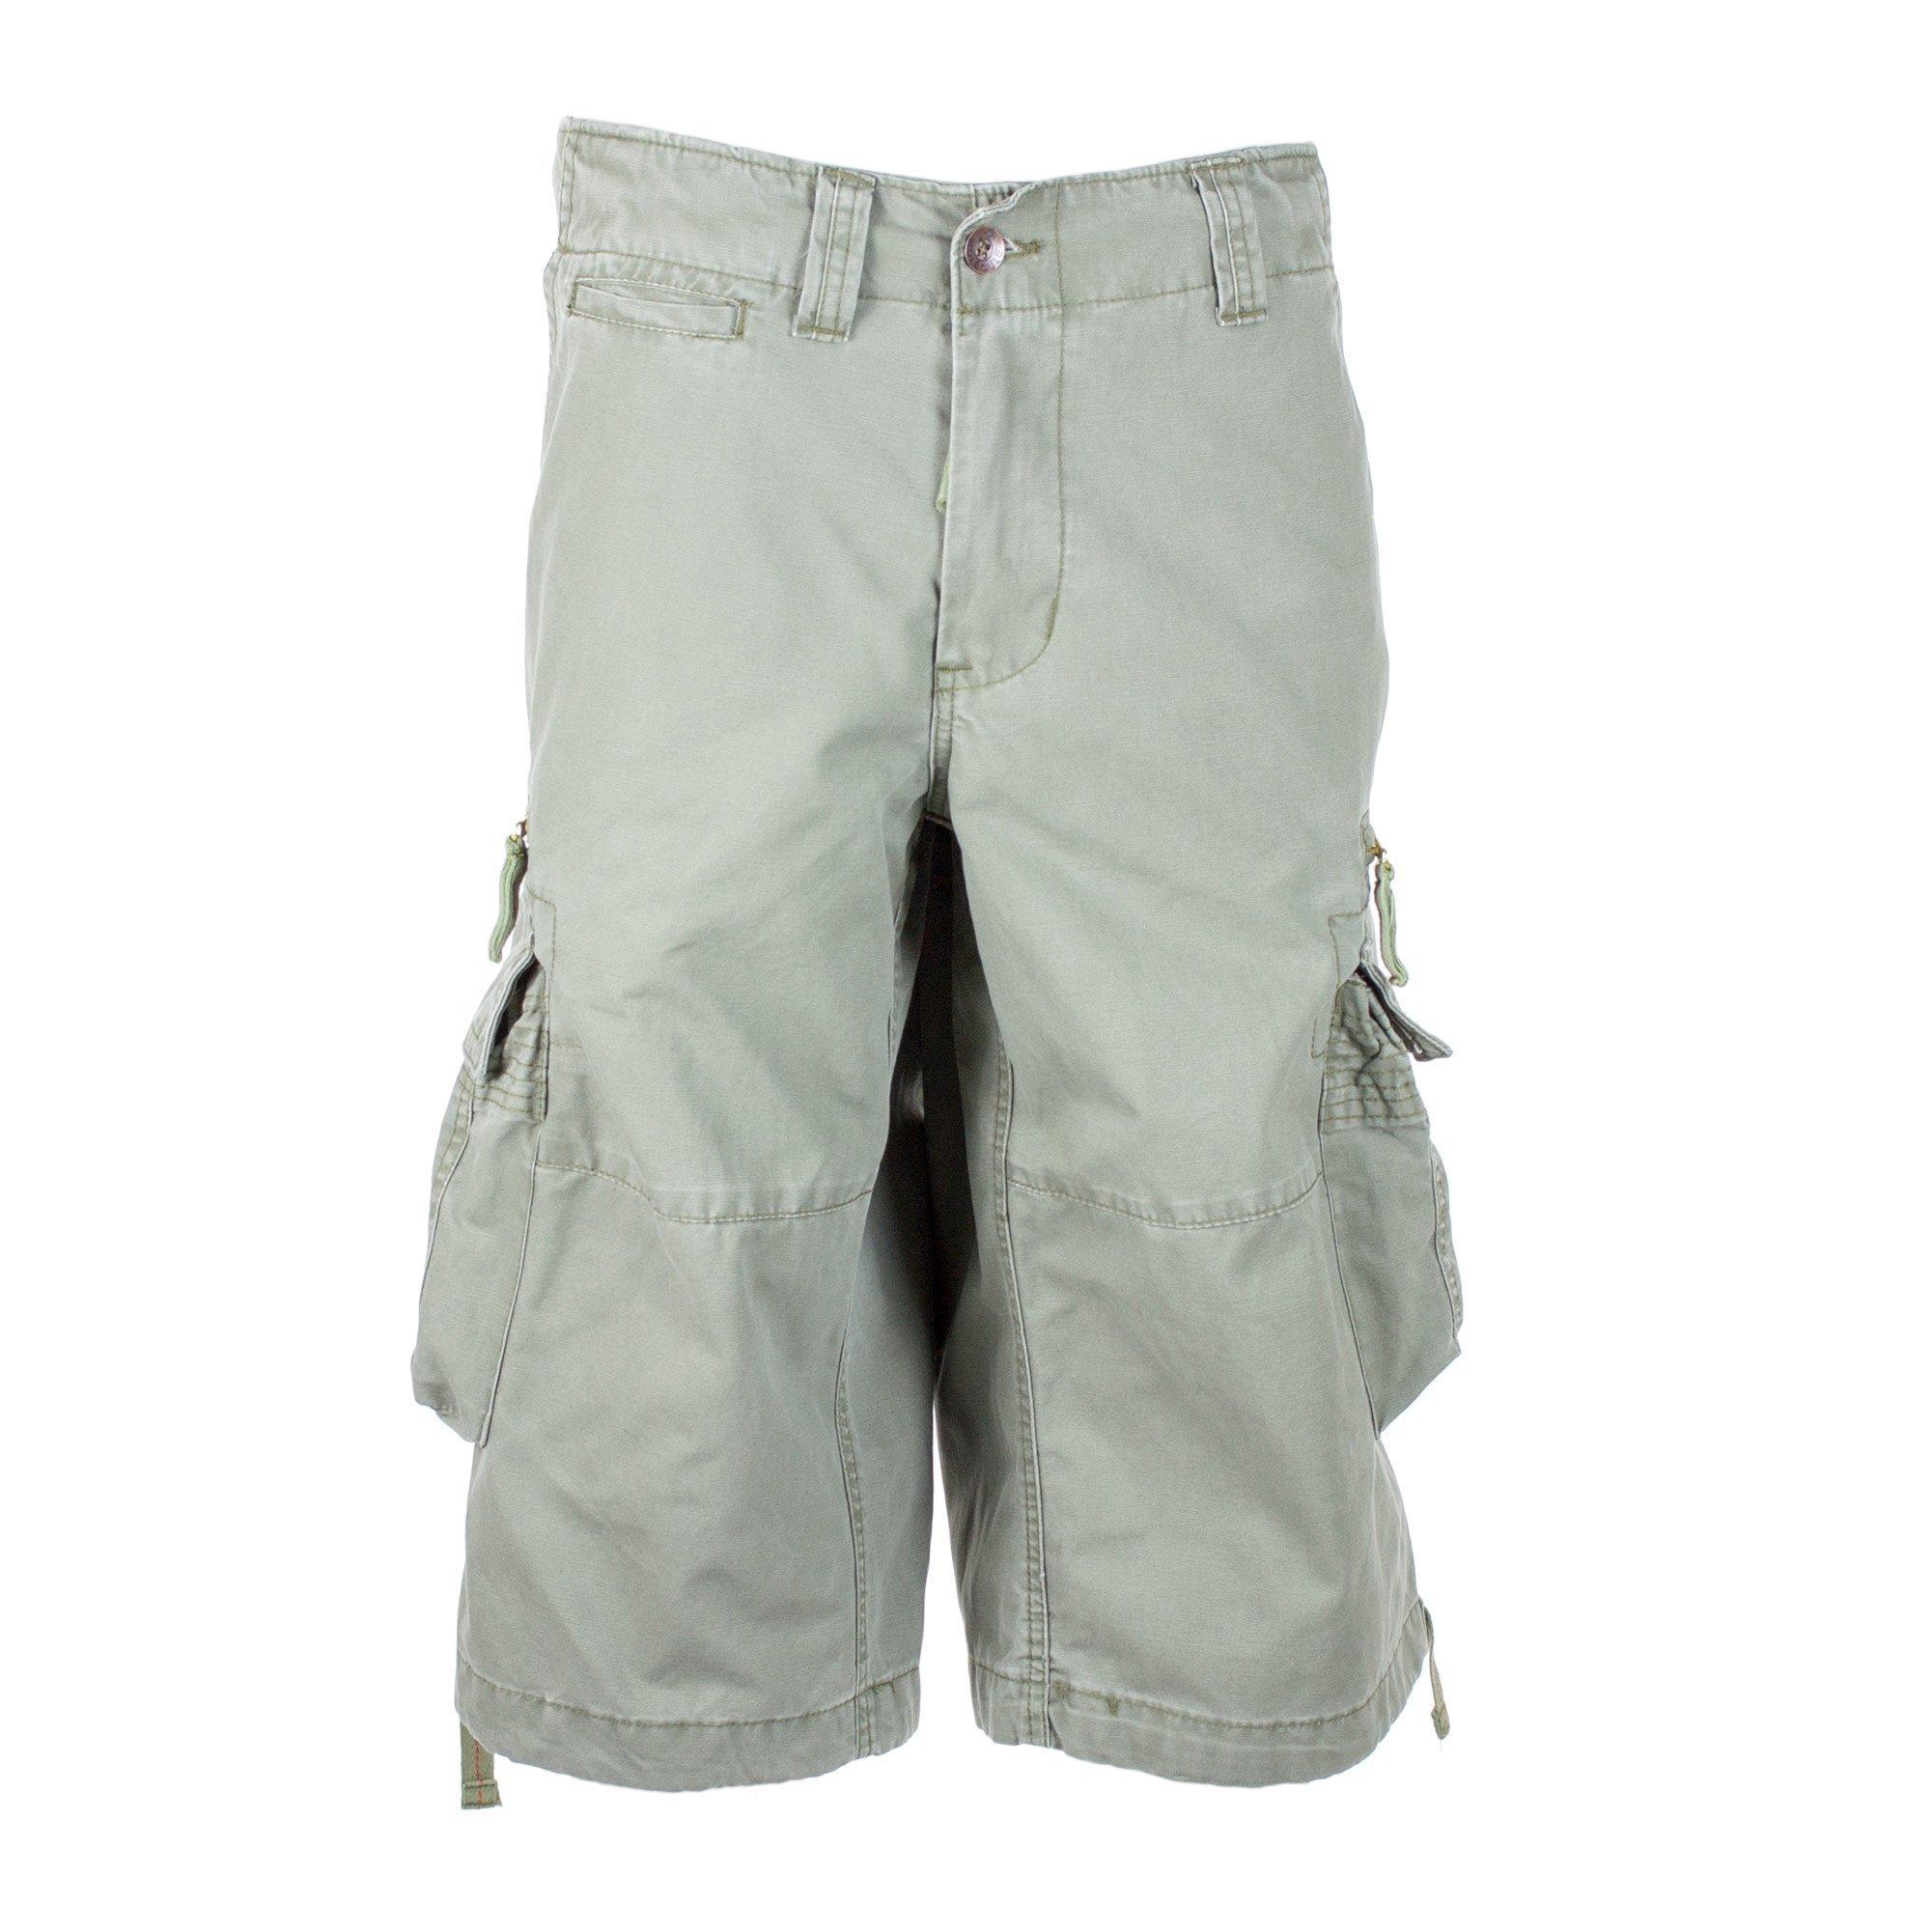 Molecule Men's Dockside Cargo Shorts - 100% Cotton Backpackers Bermudas Combats   USA 31''/S (Tag S) Field Green